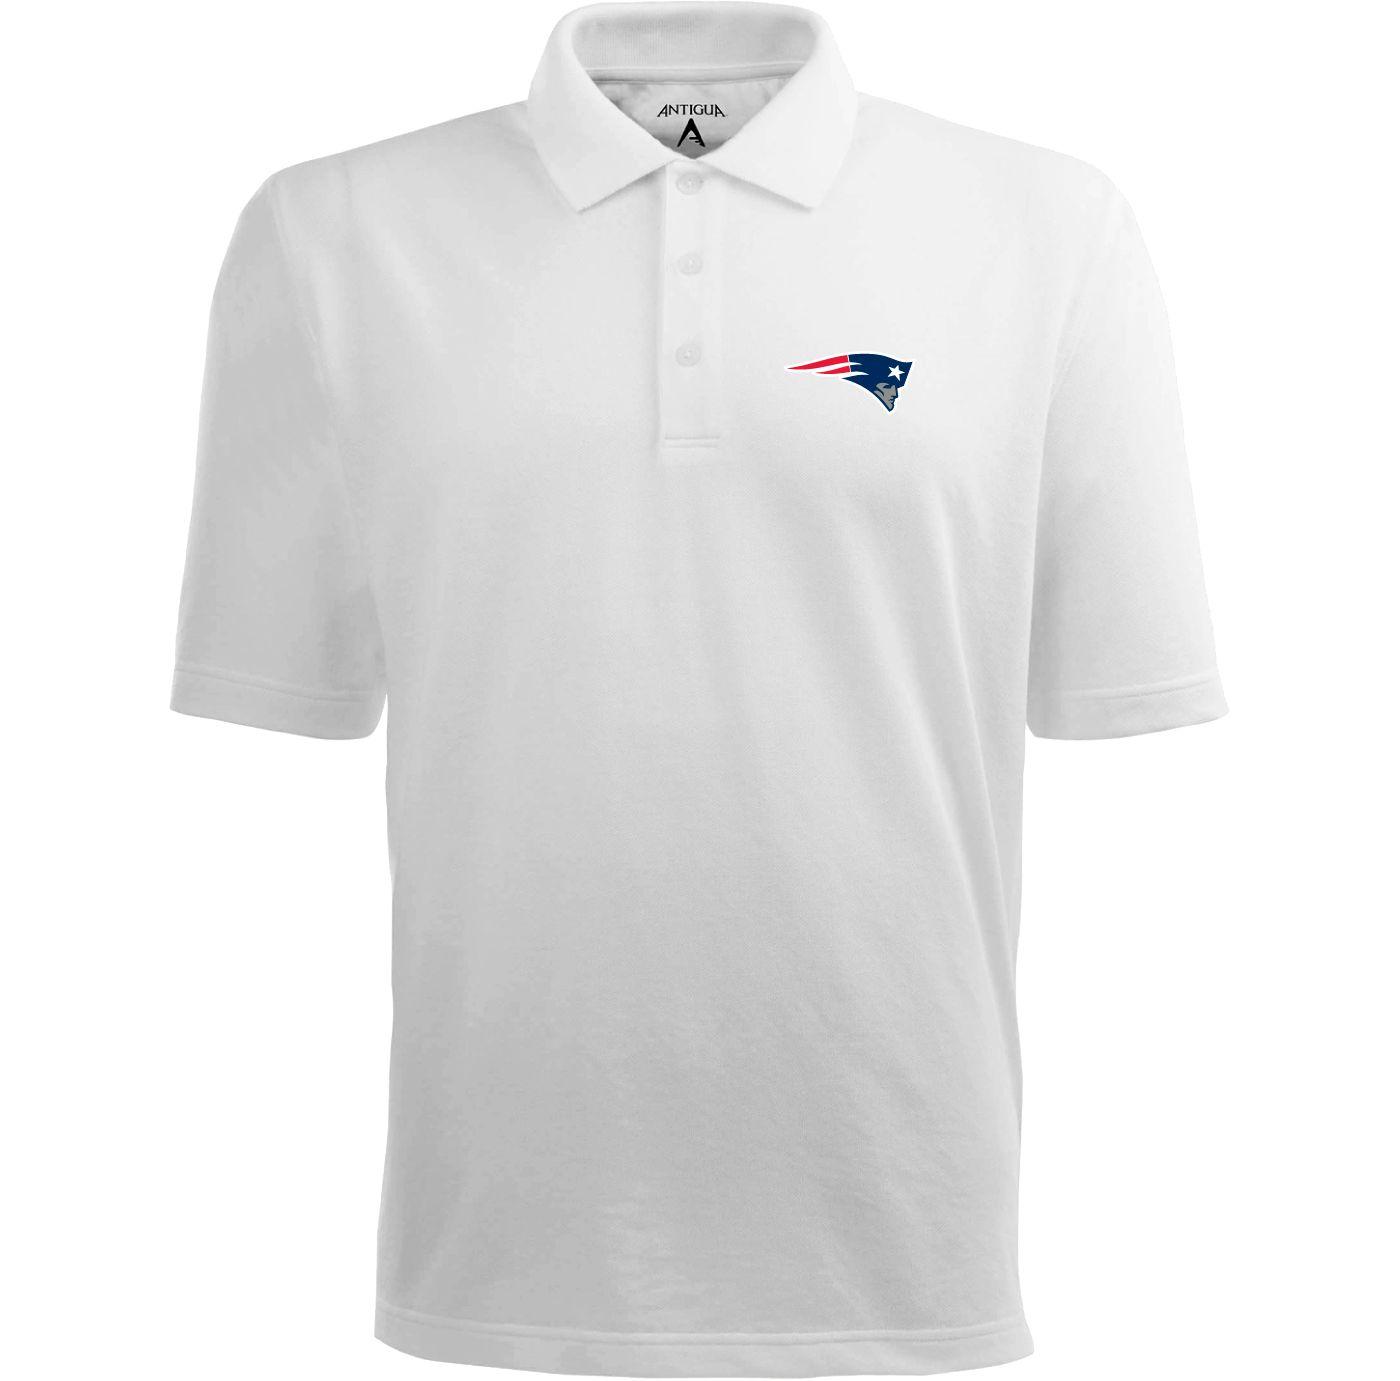 Antigua Men's New England Patriots Pique Xtra-Lite White Polo